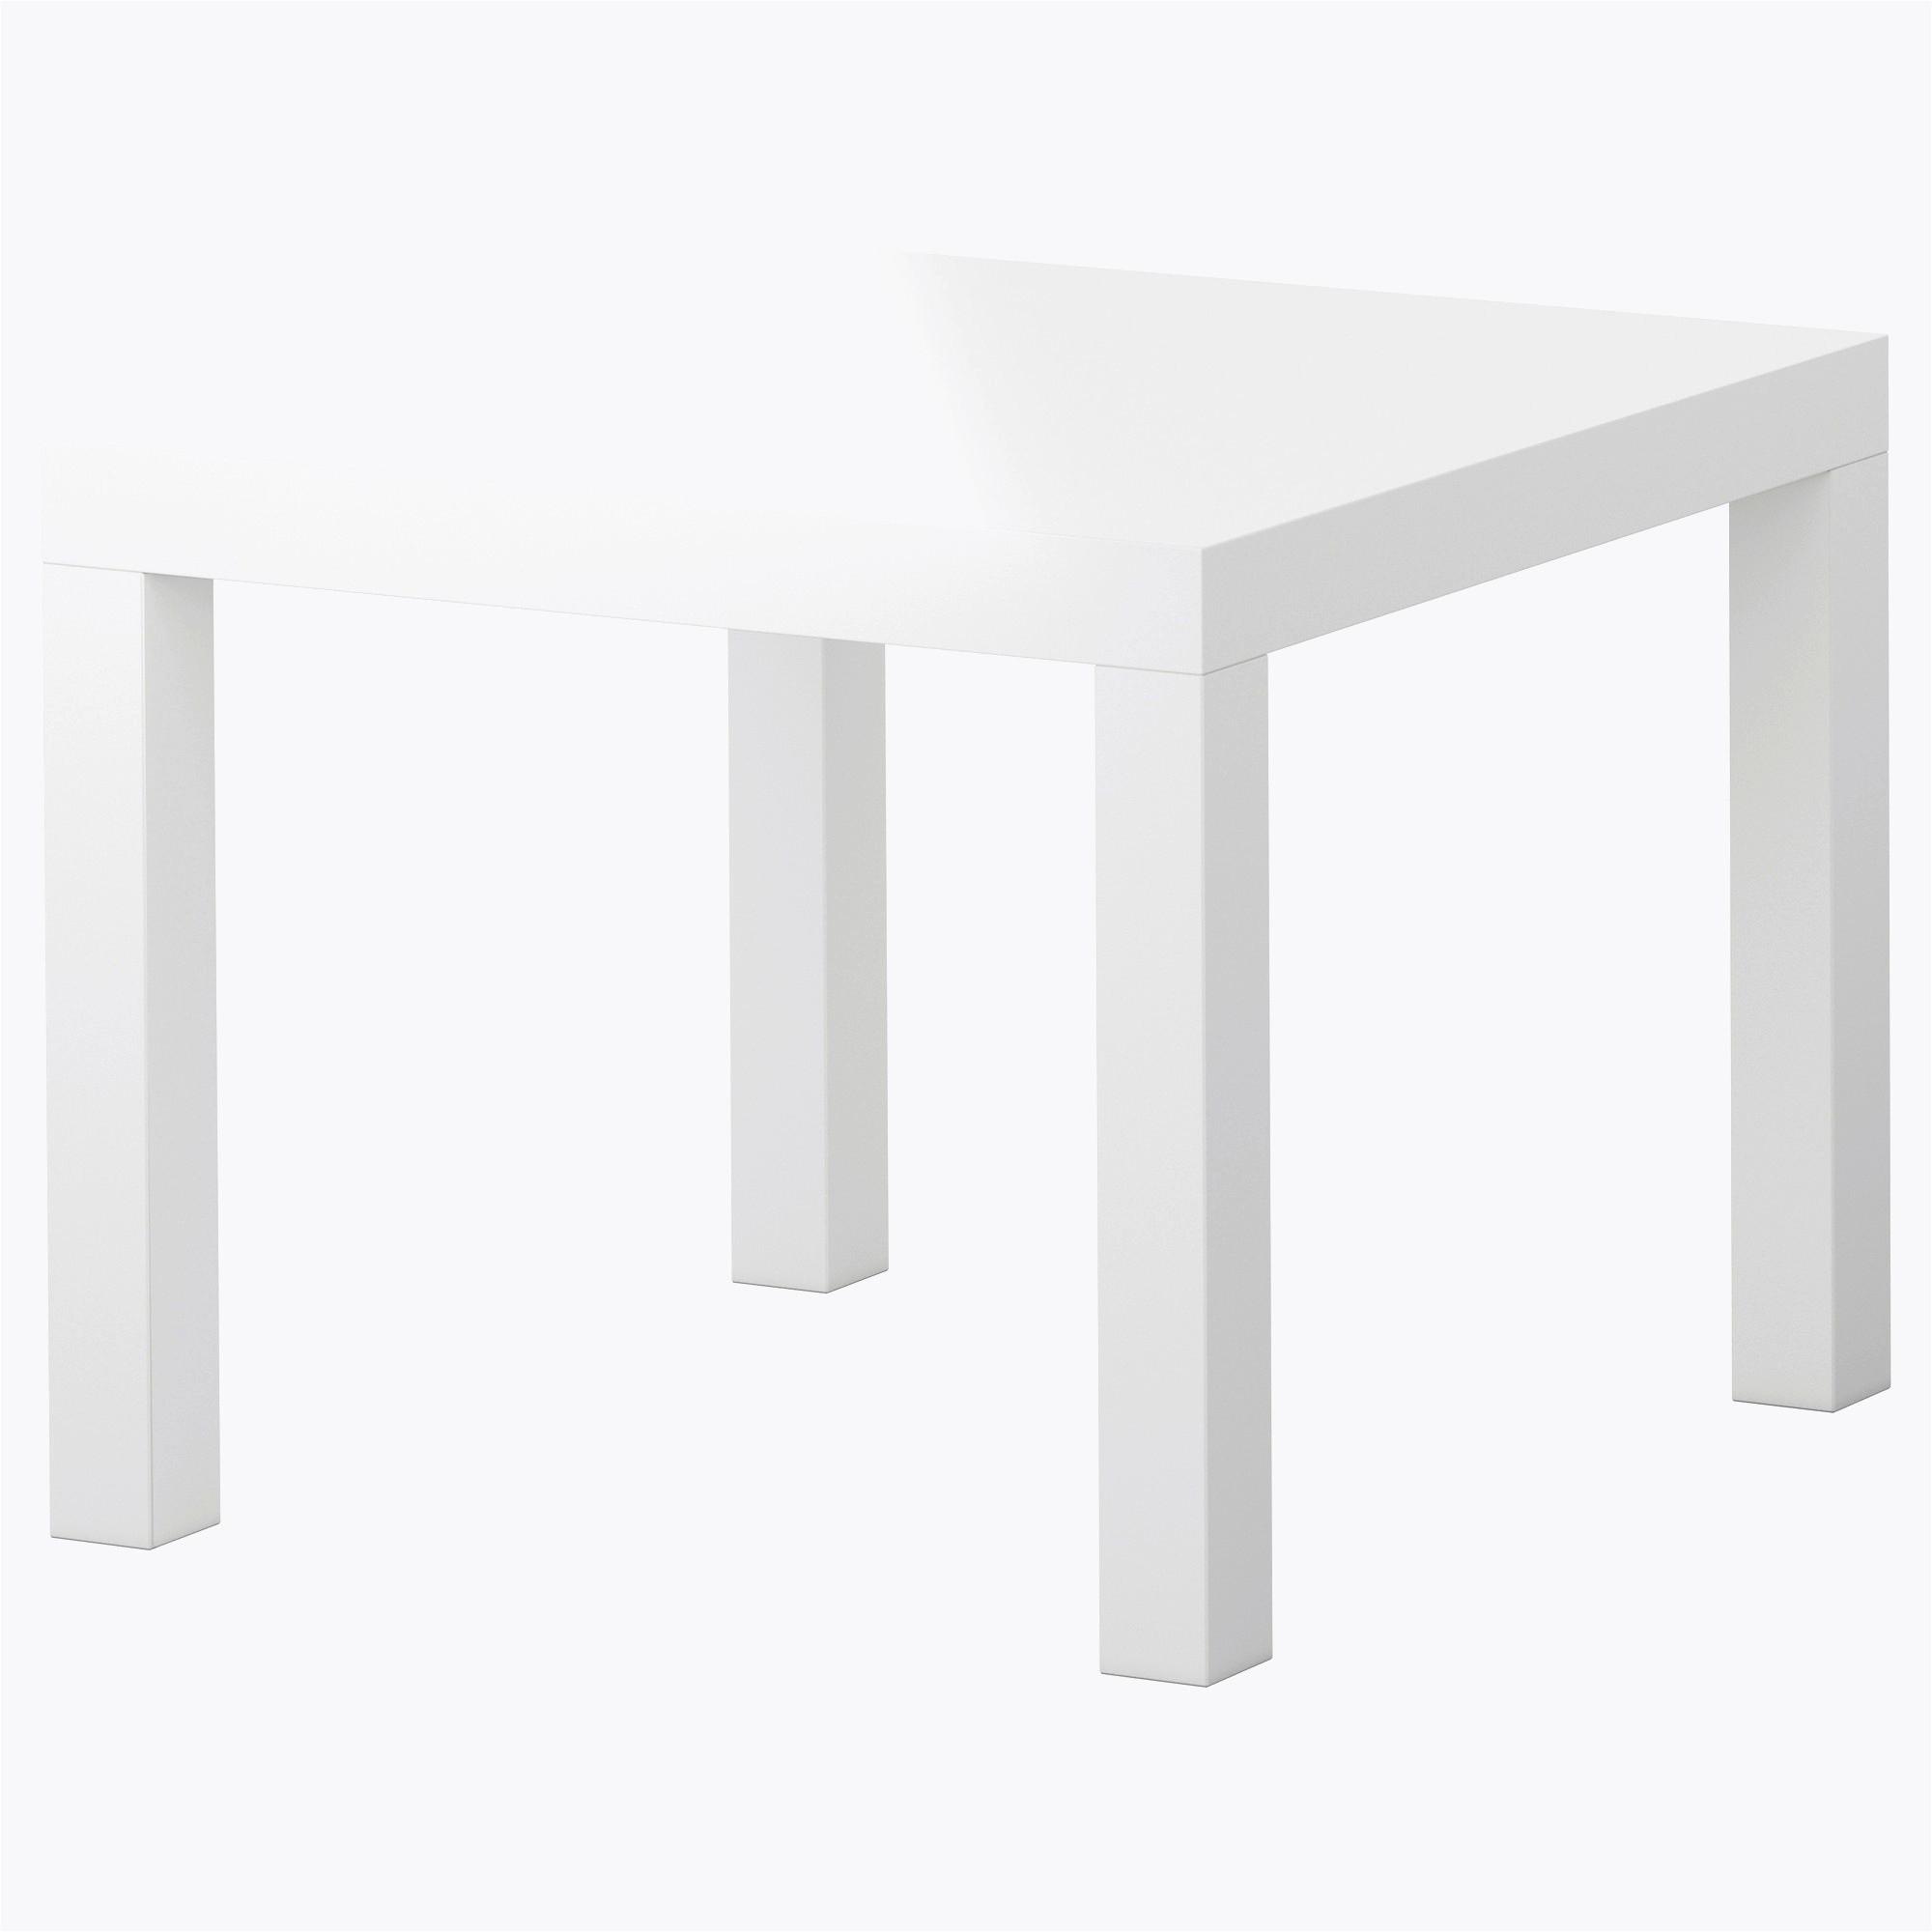 35 Idées De Design Clic Clac Ikea encequiconcerne Luckytroll Ikea